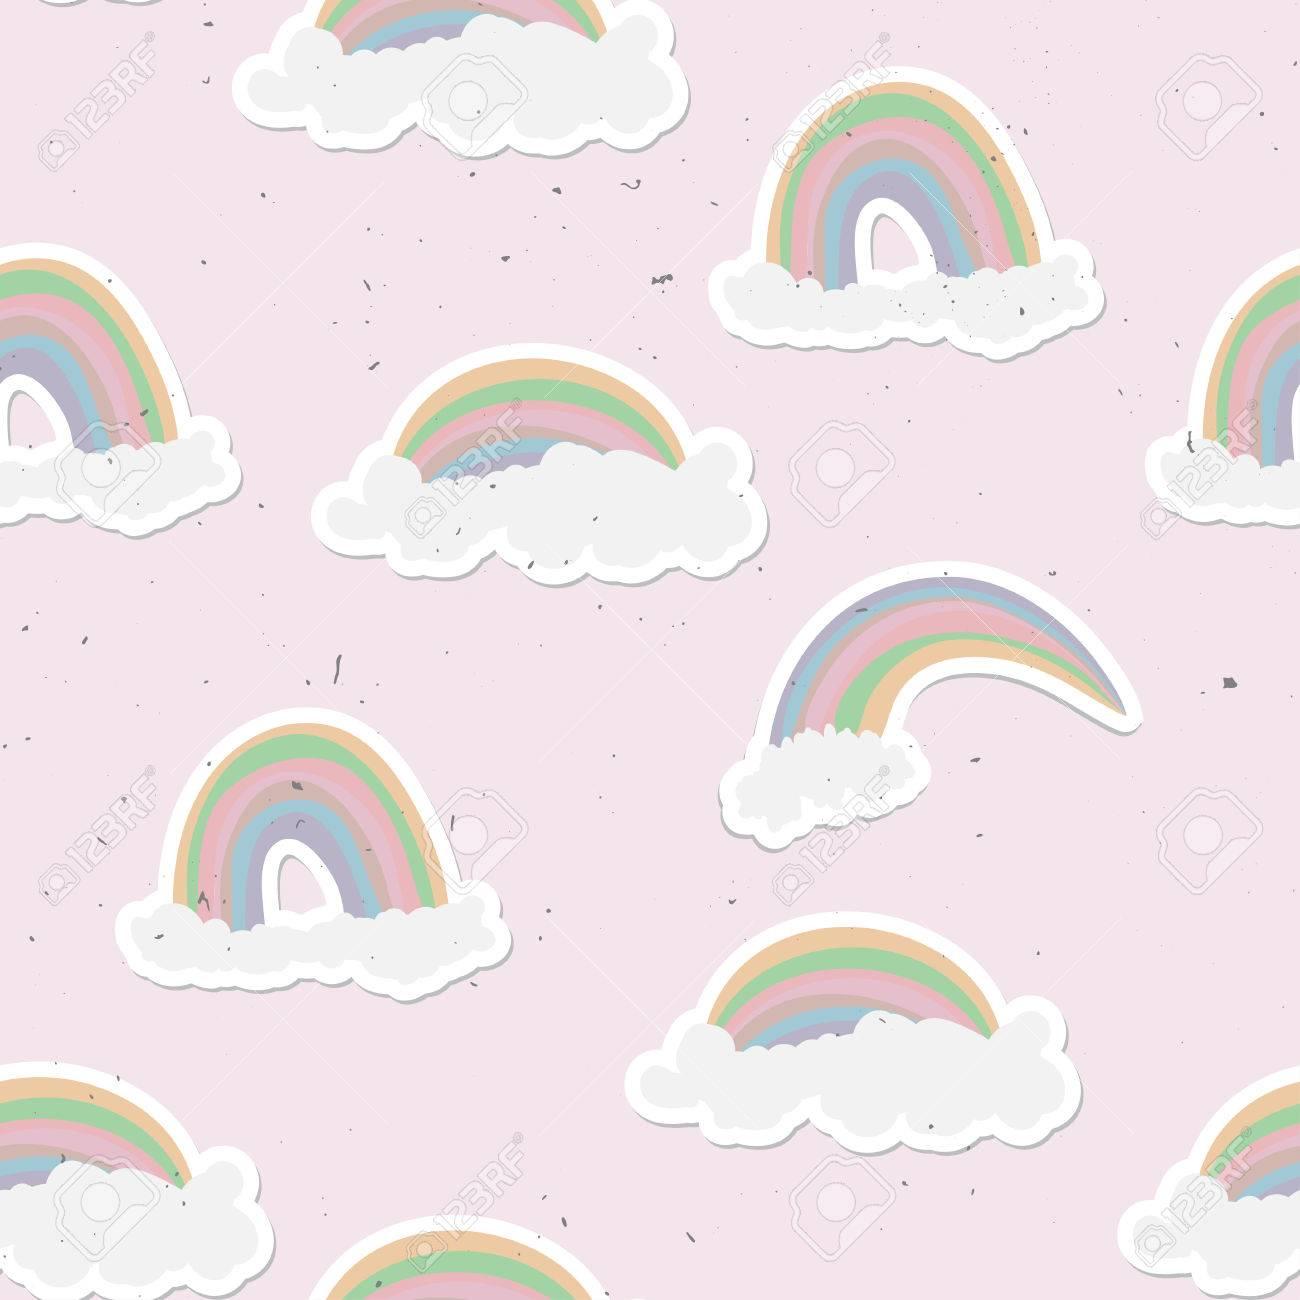 Cute rainbow seamless pattern sweet rainbow and clouds background cute rainbow seamless pattern sweet rainbow and clouds background 82040755 voltagebd Choice Image